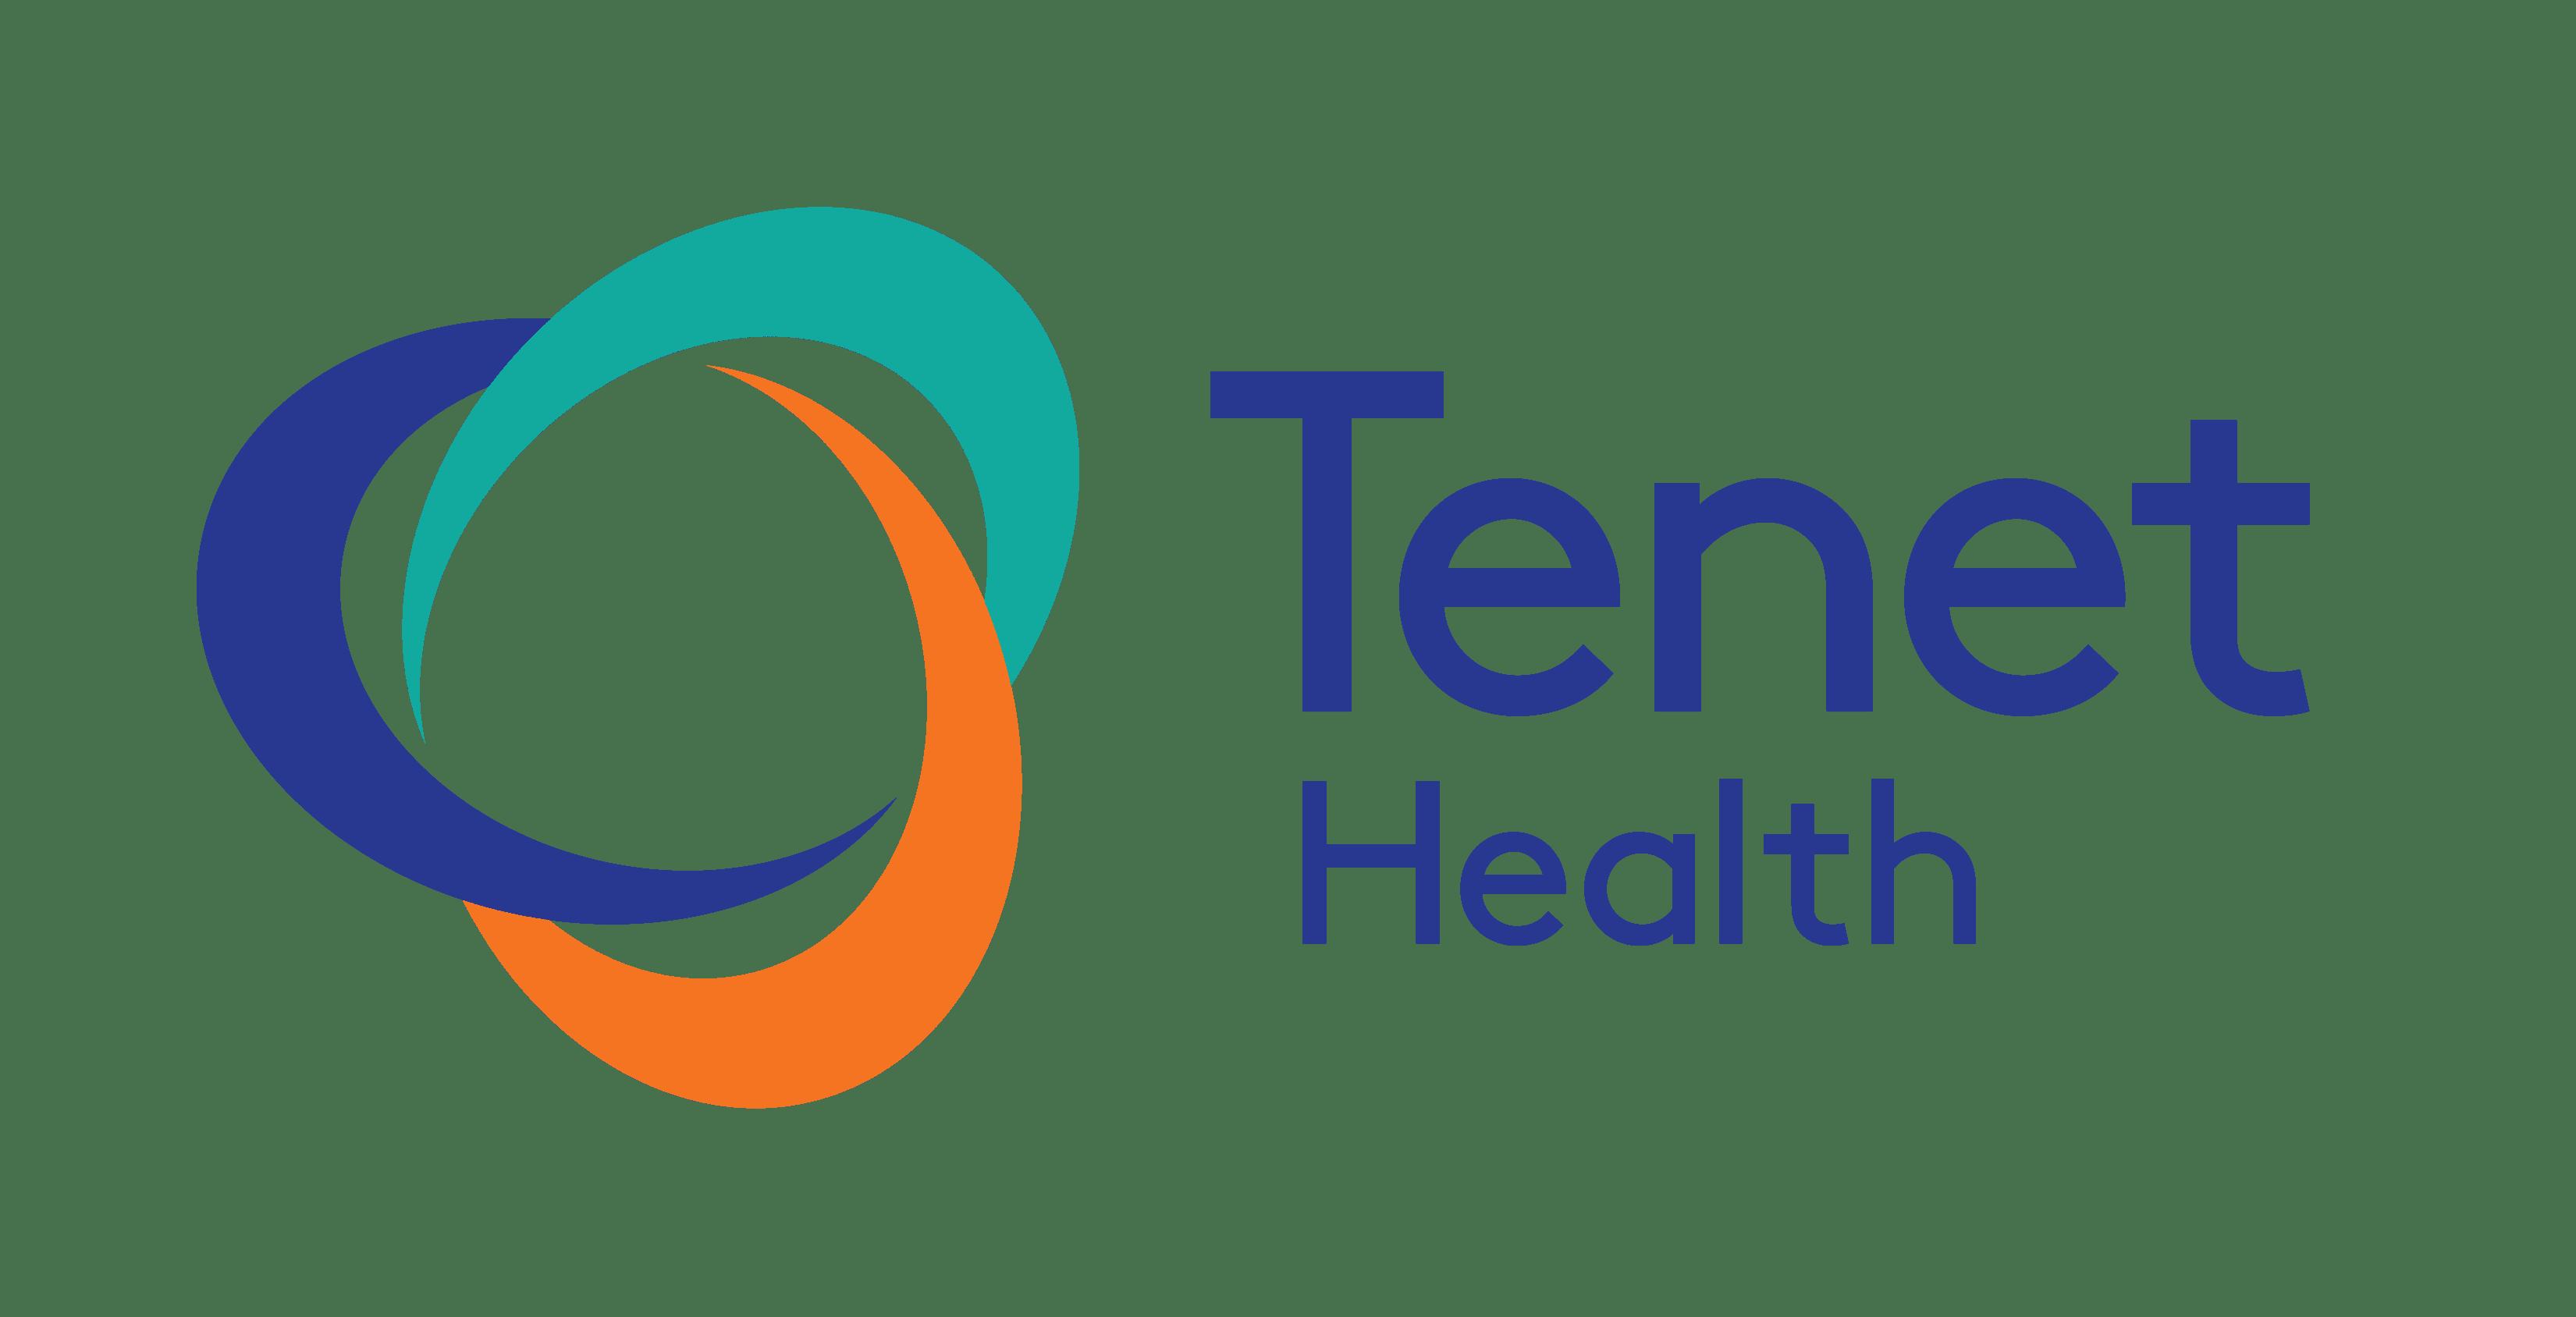 Tenet_Health_logo